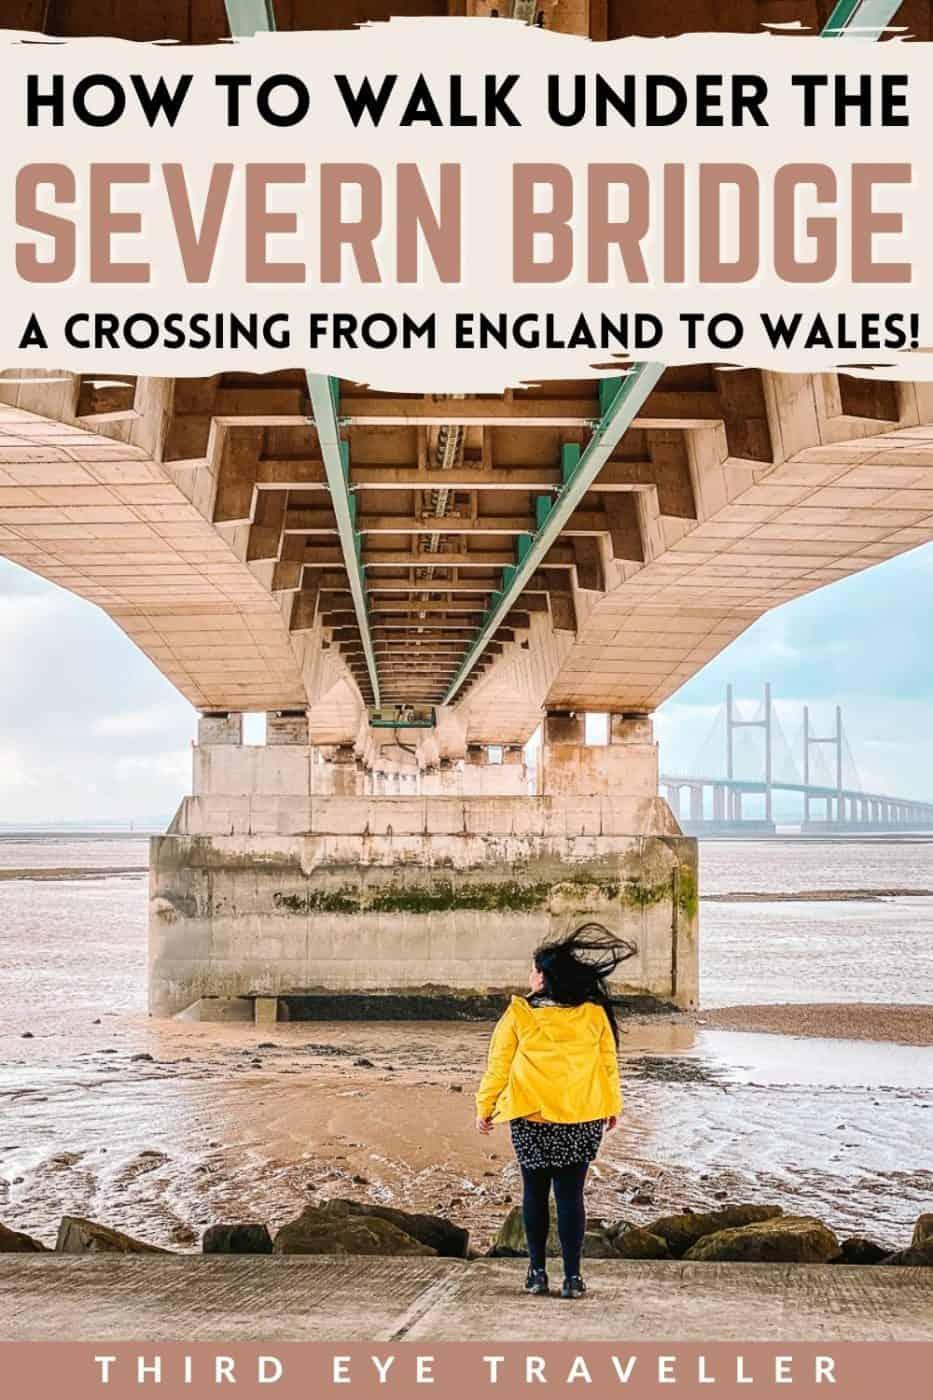 Severn Beach Walk Under the Severn bridge England to Wales